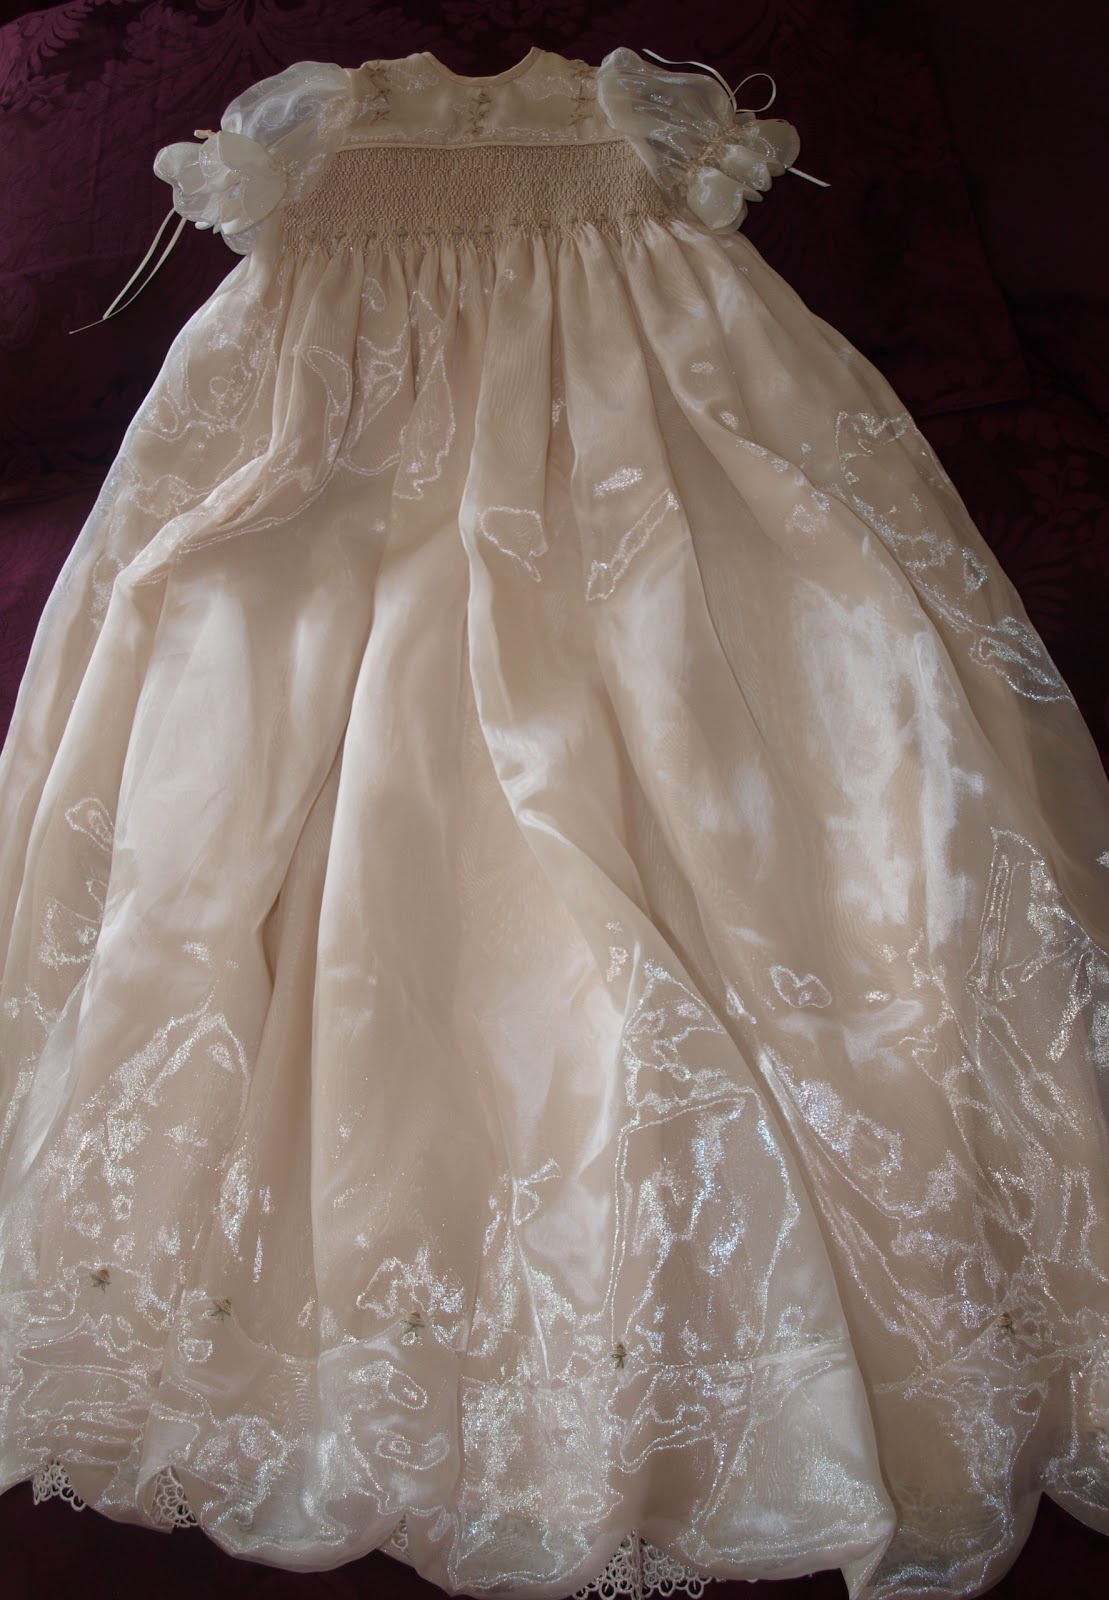 A Little Bit of Heaven...: Heirloom Christening Gown